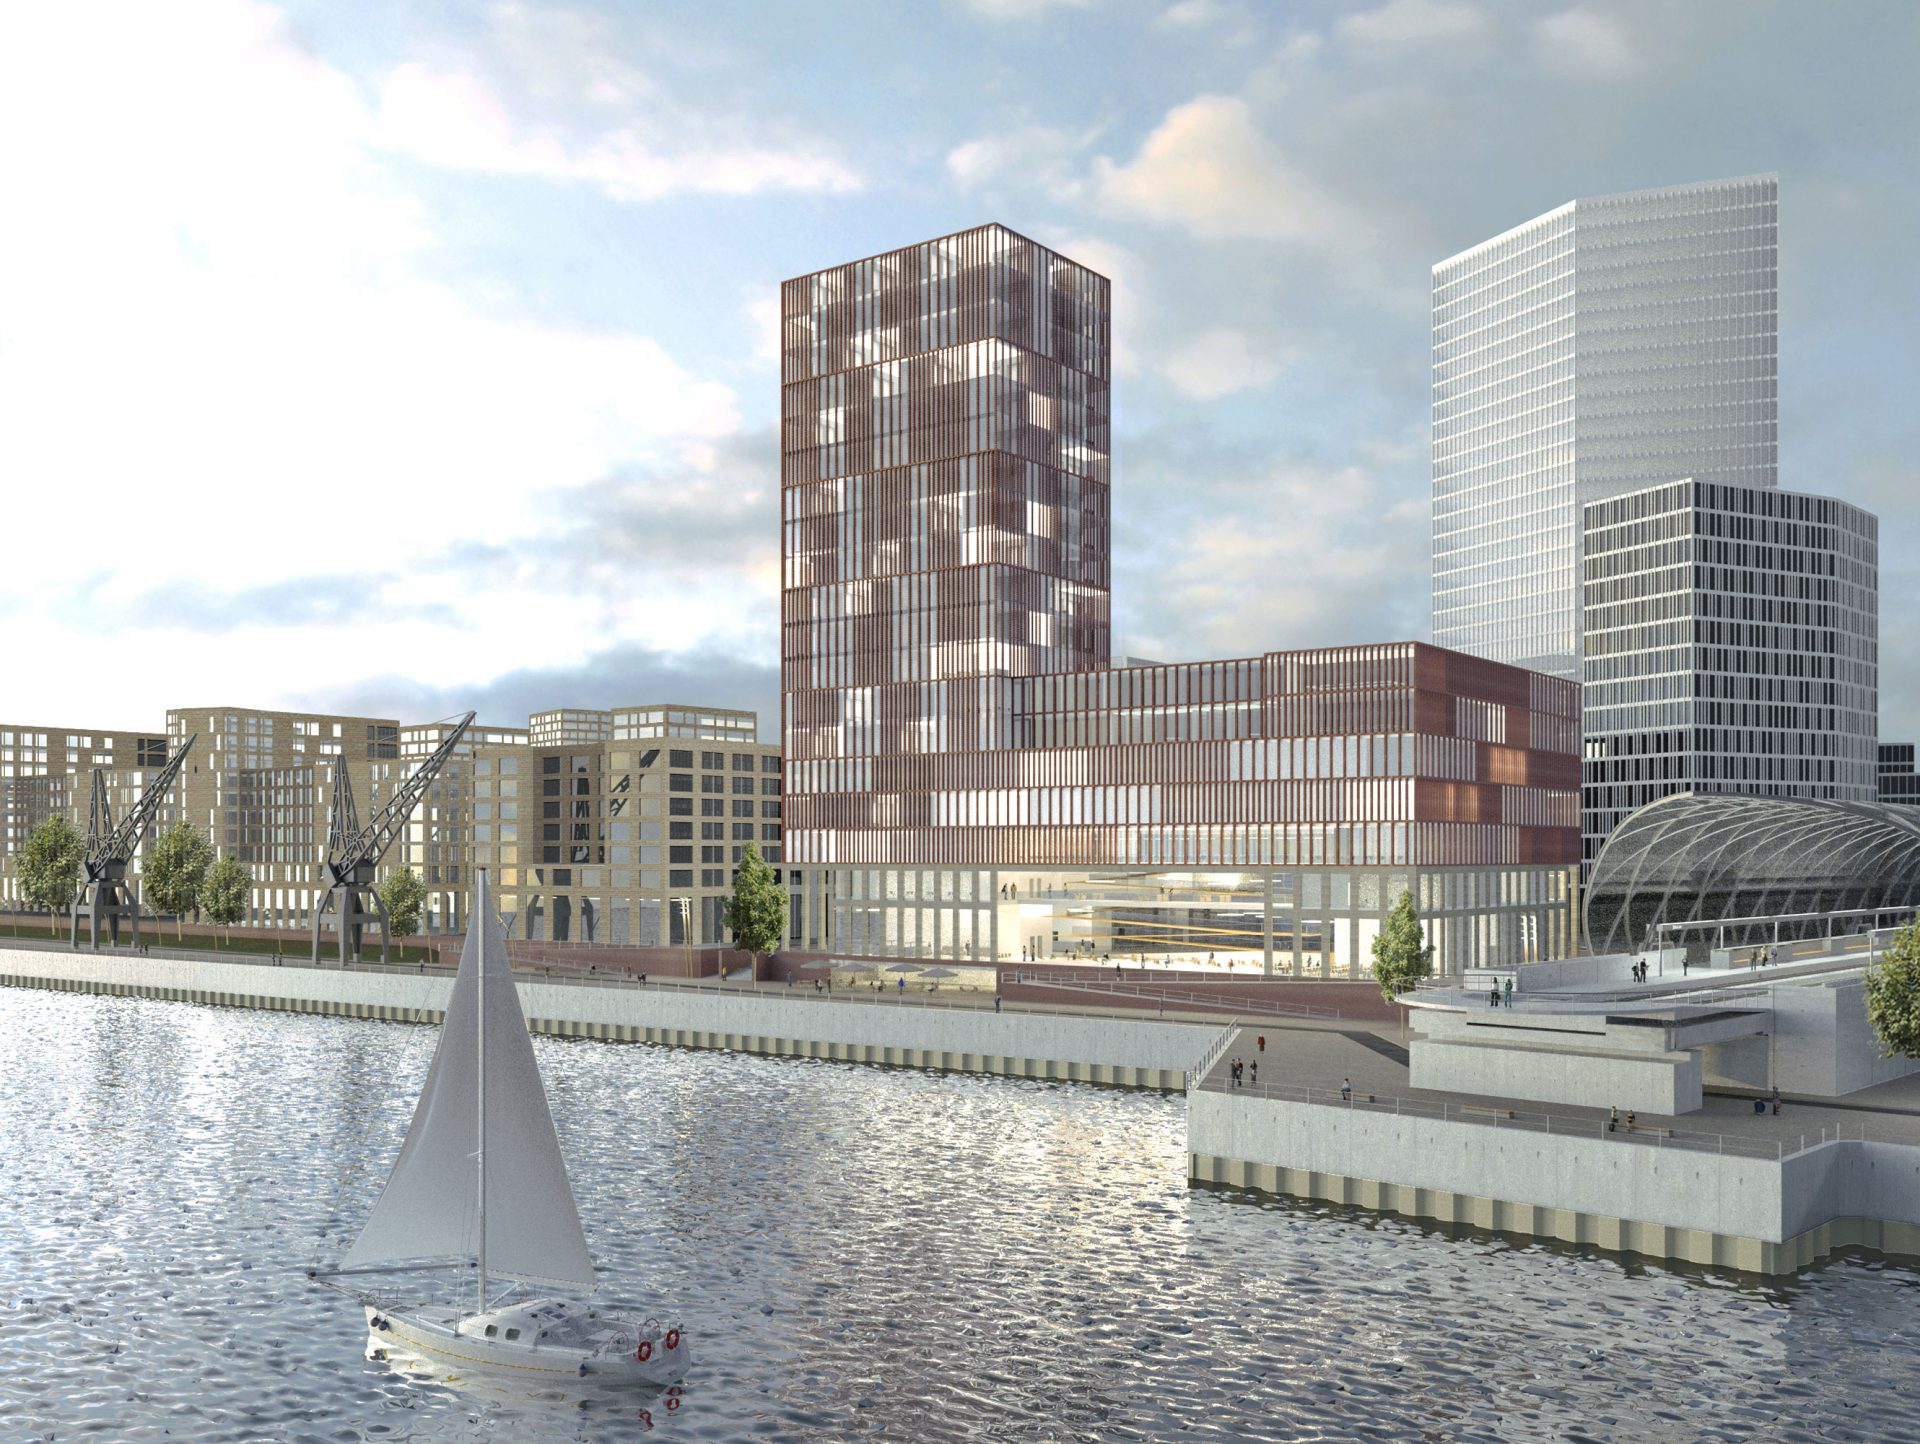 Präventionszentrum HafenCity Hamburg